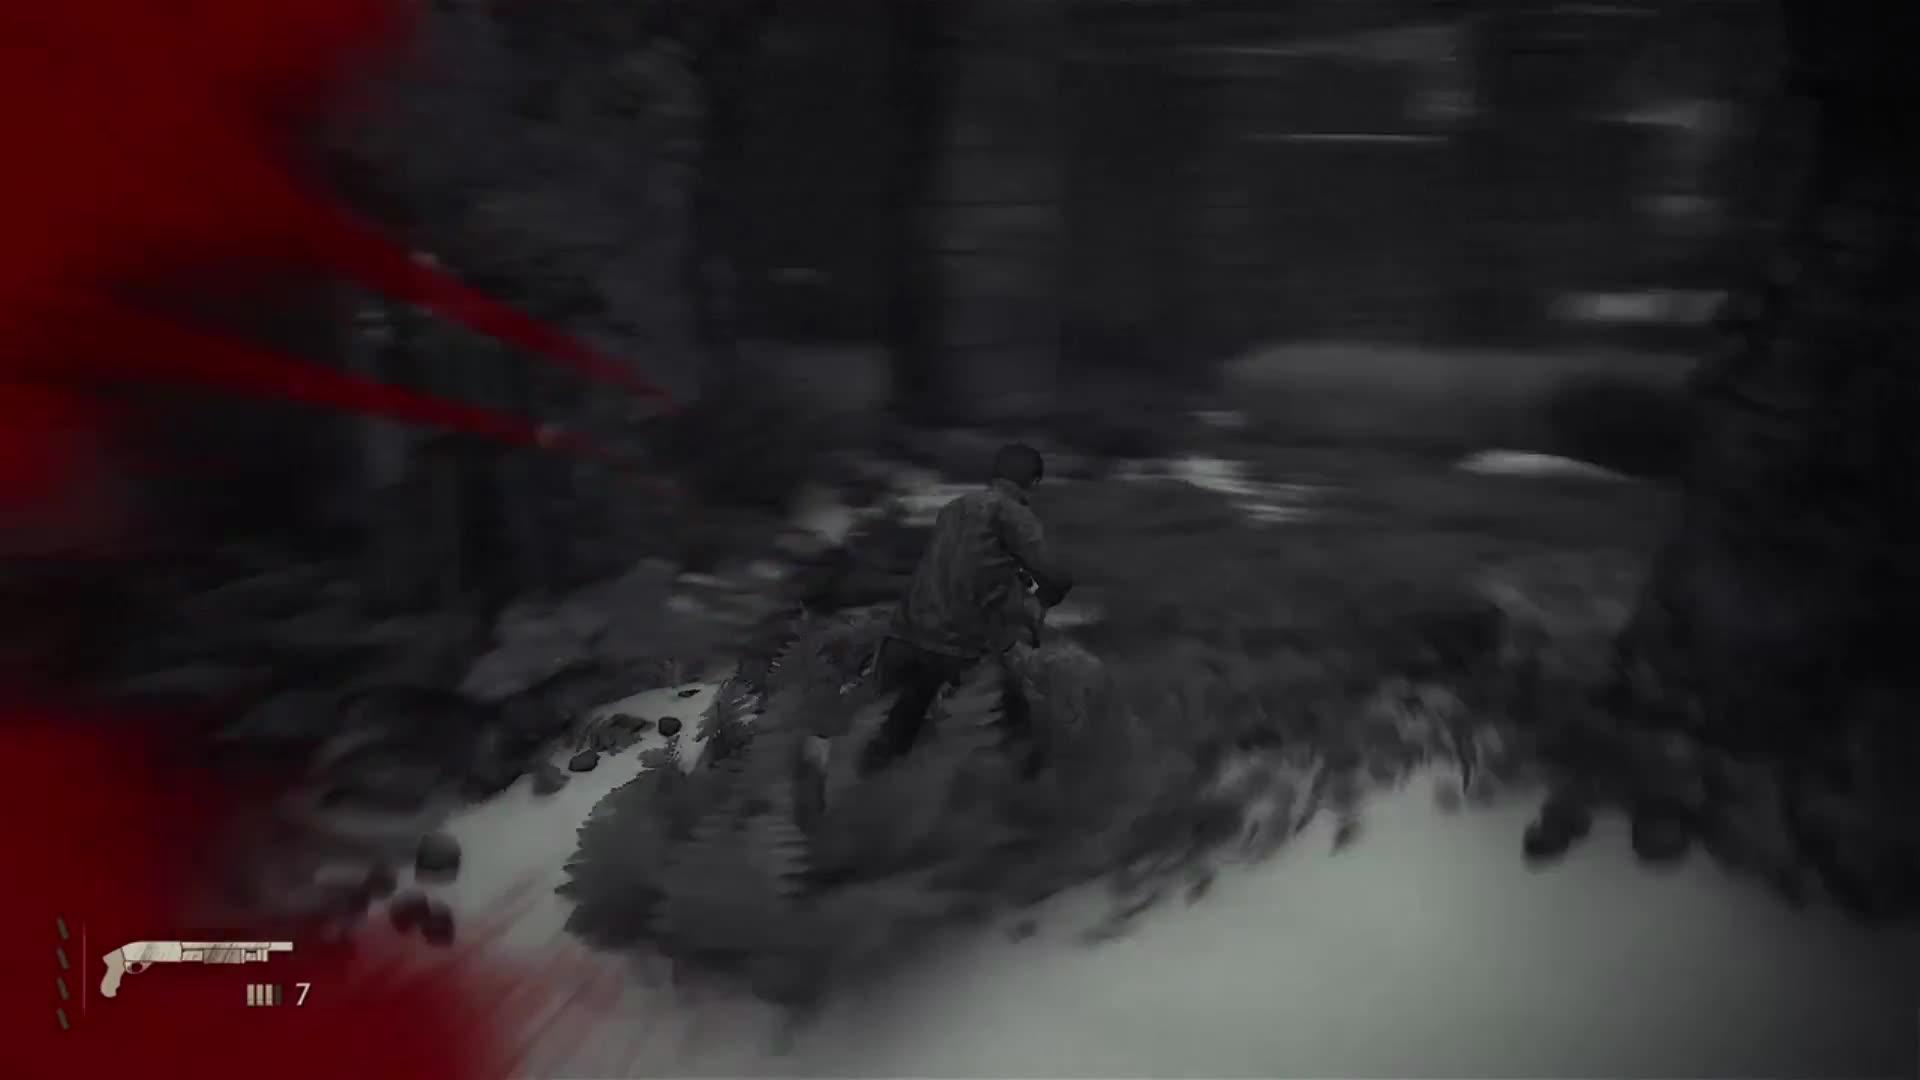 uncharted 4 GIFs